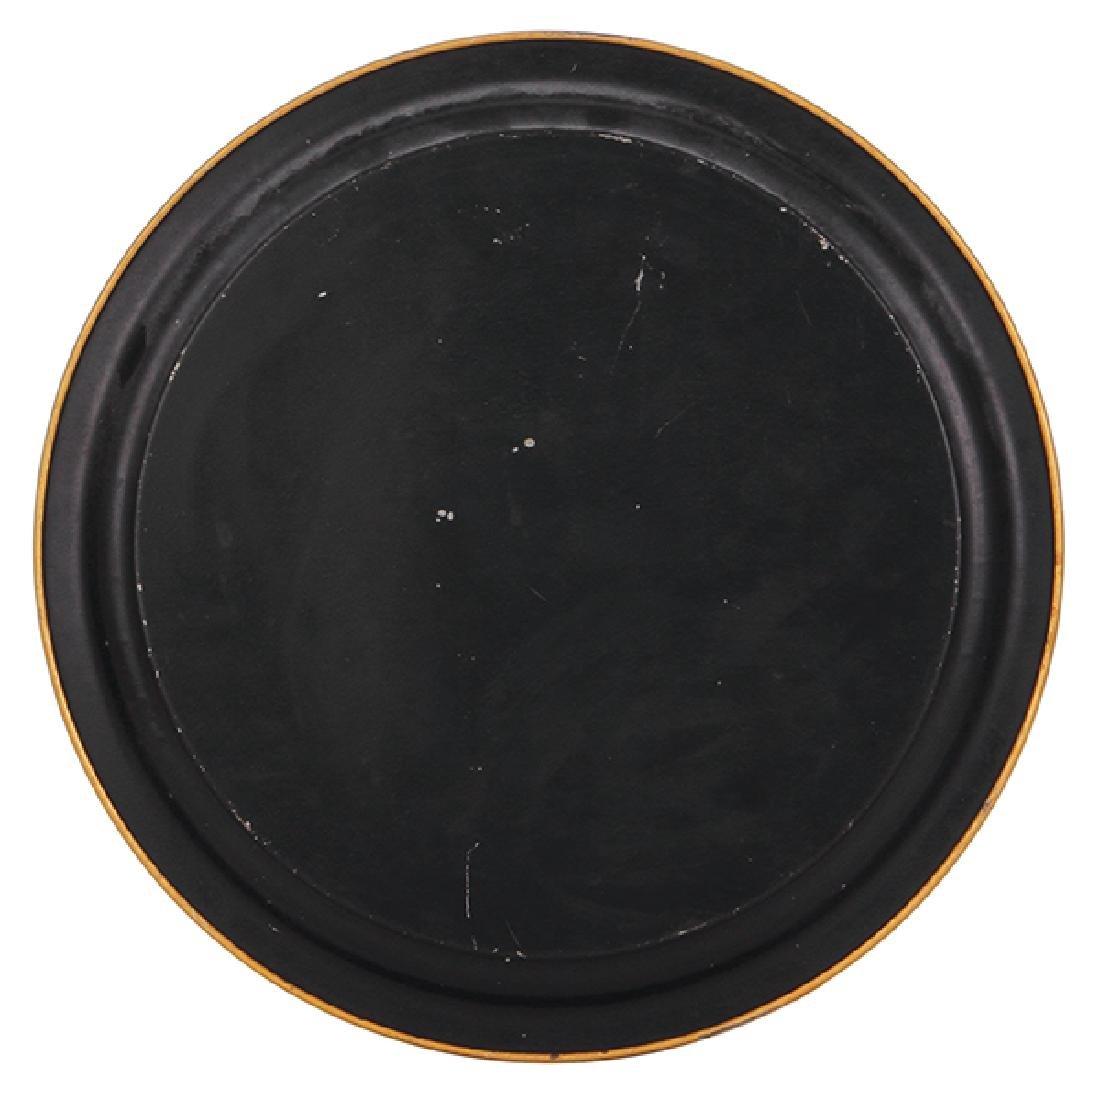 Wm. J. Lemp Brewing Co., tray, - 2